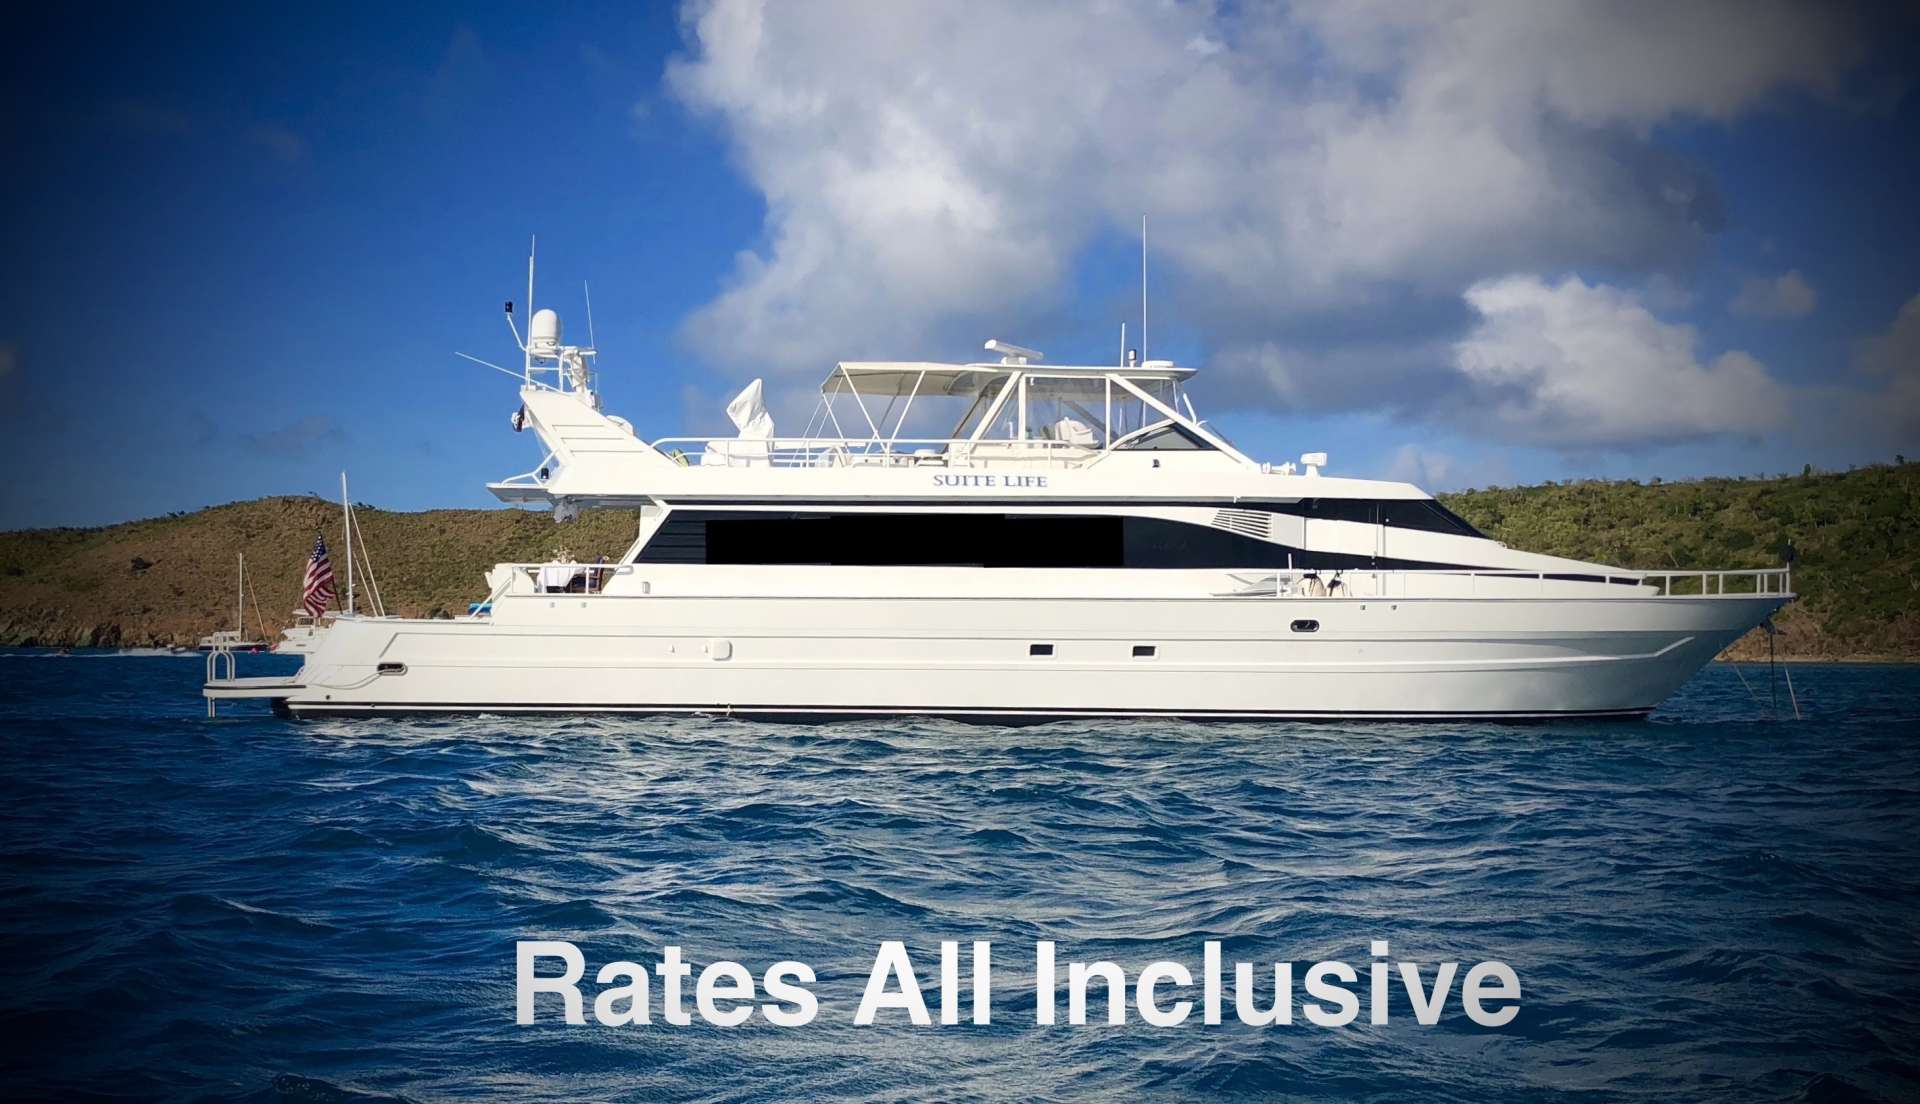 Power Yacht 'Power', 8 PAX, 3 Crew, 92.00 Ft, 28.00 Meters, Built 1998, Tarrab Yachts, Refit Year 2016